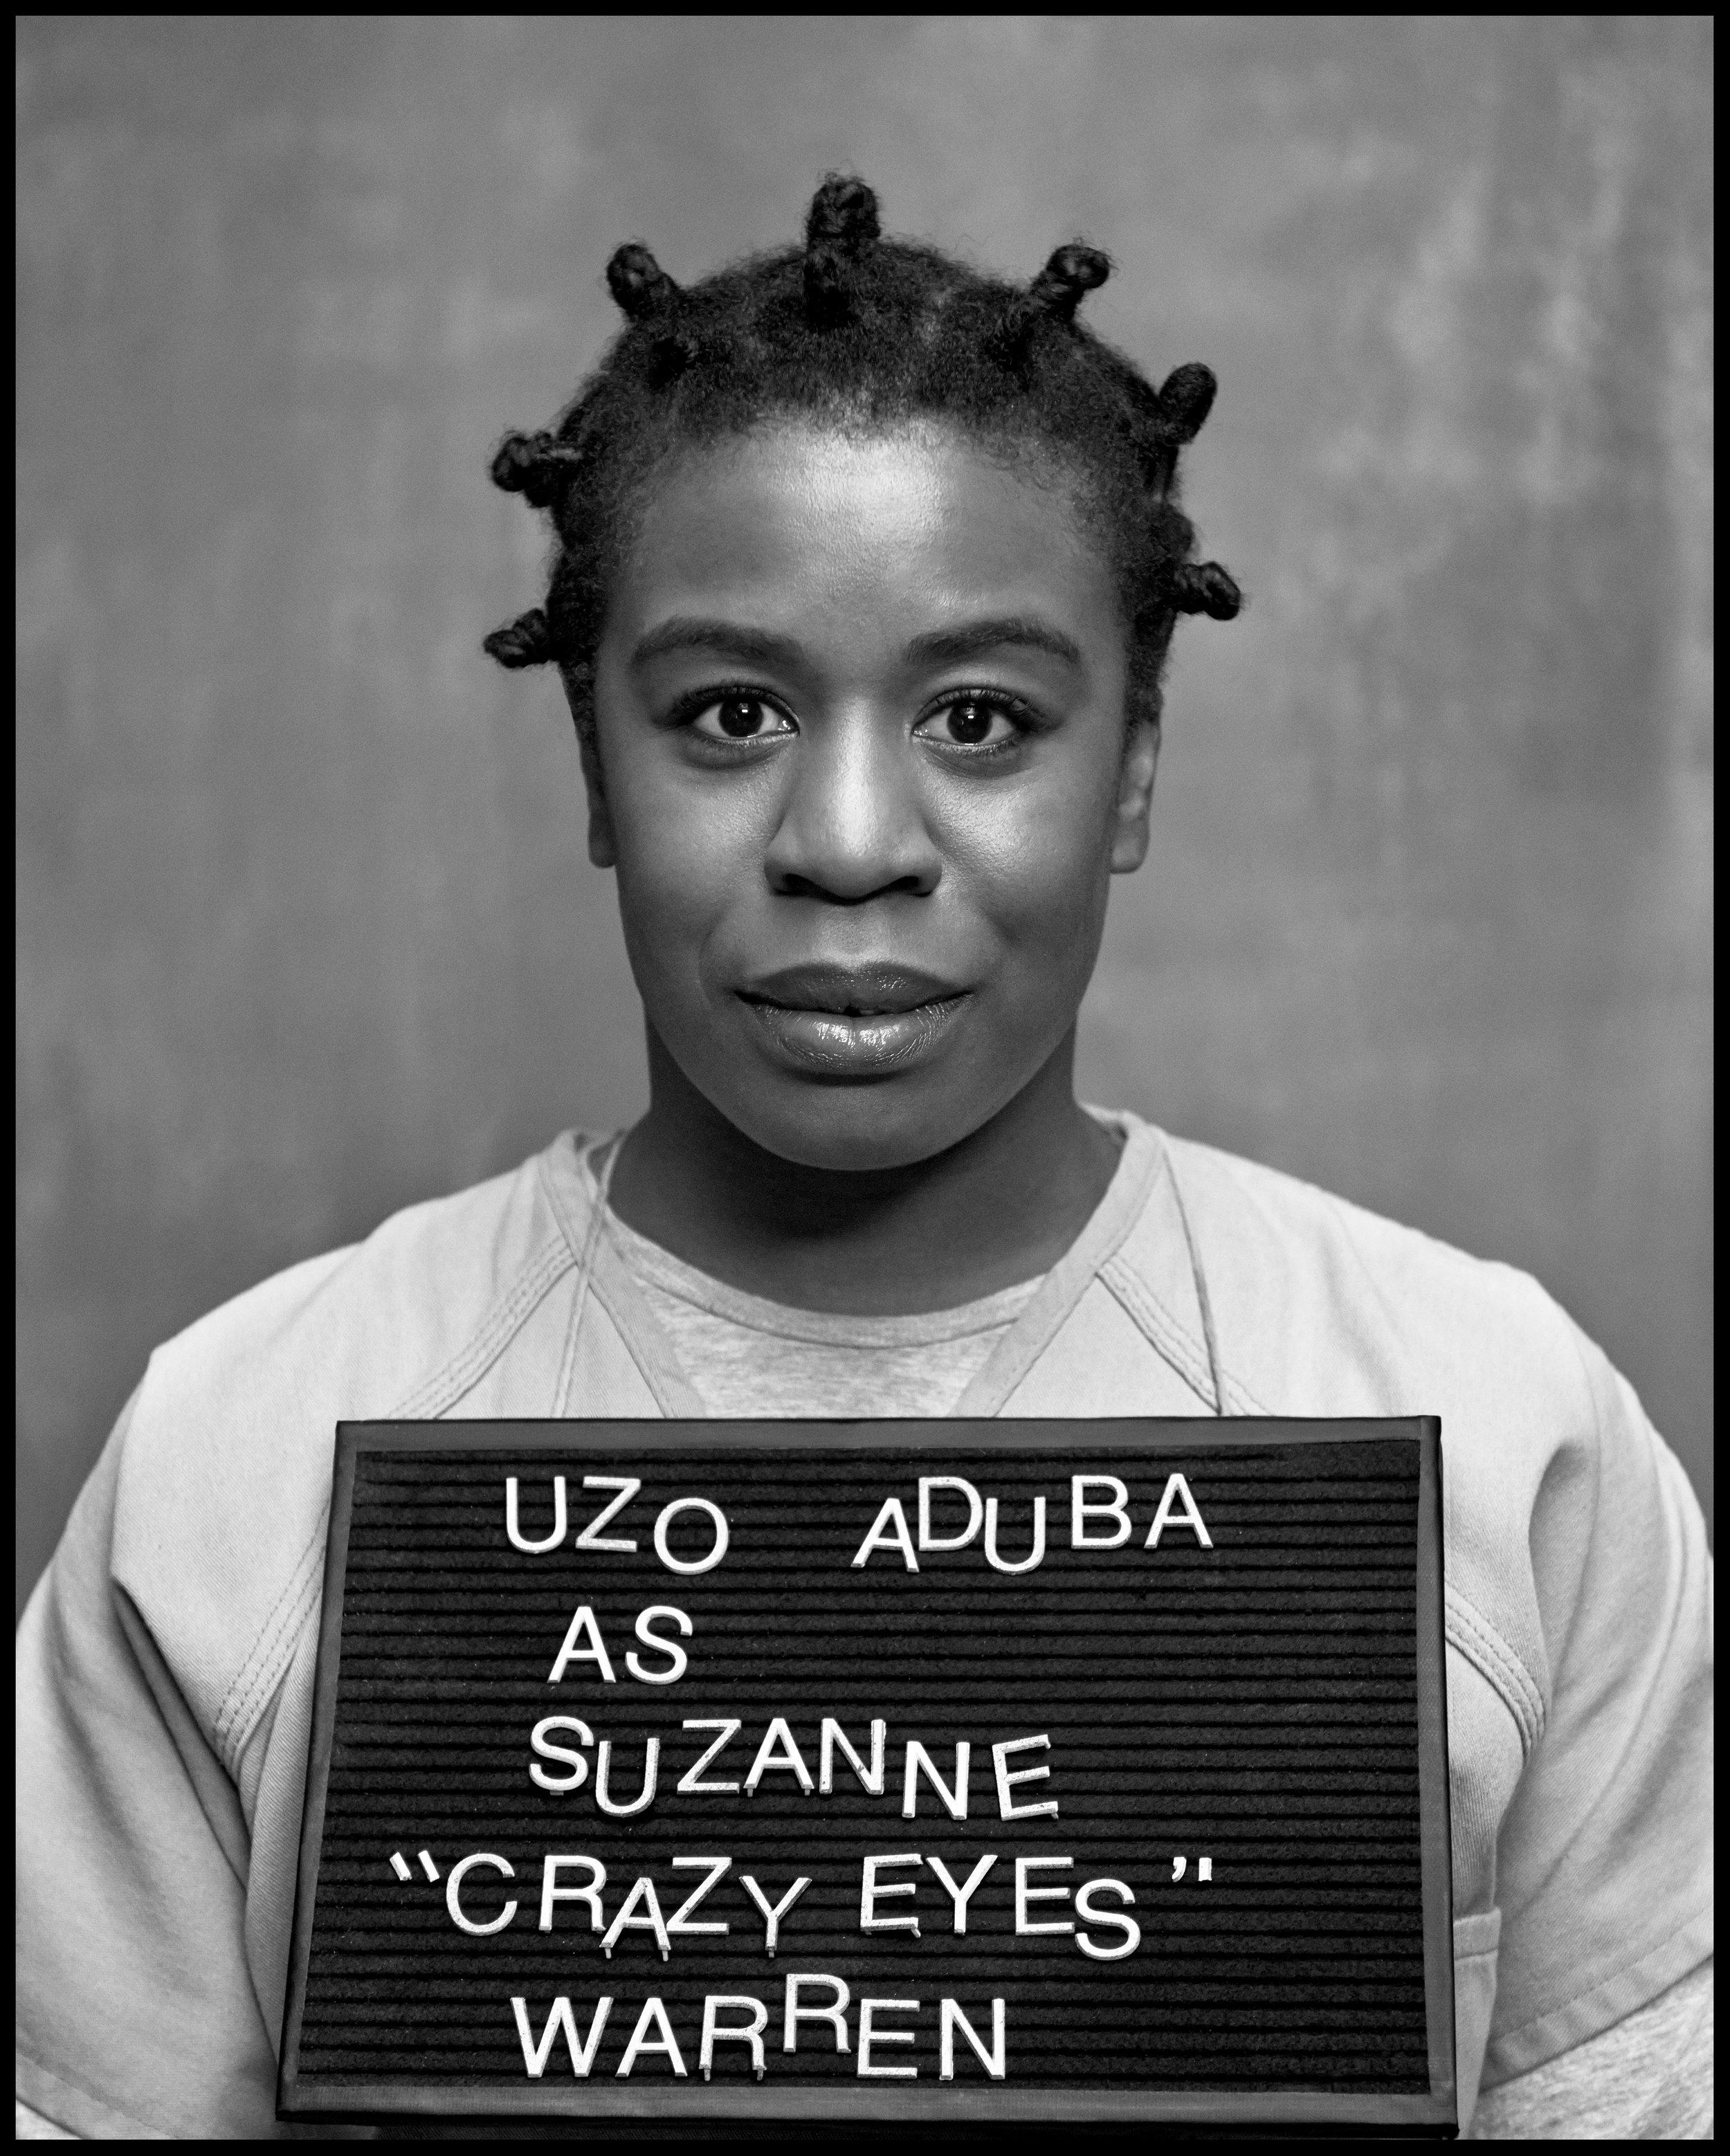 Uzo Aduba for Orange Is The New Black